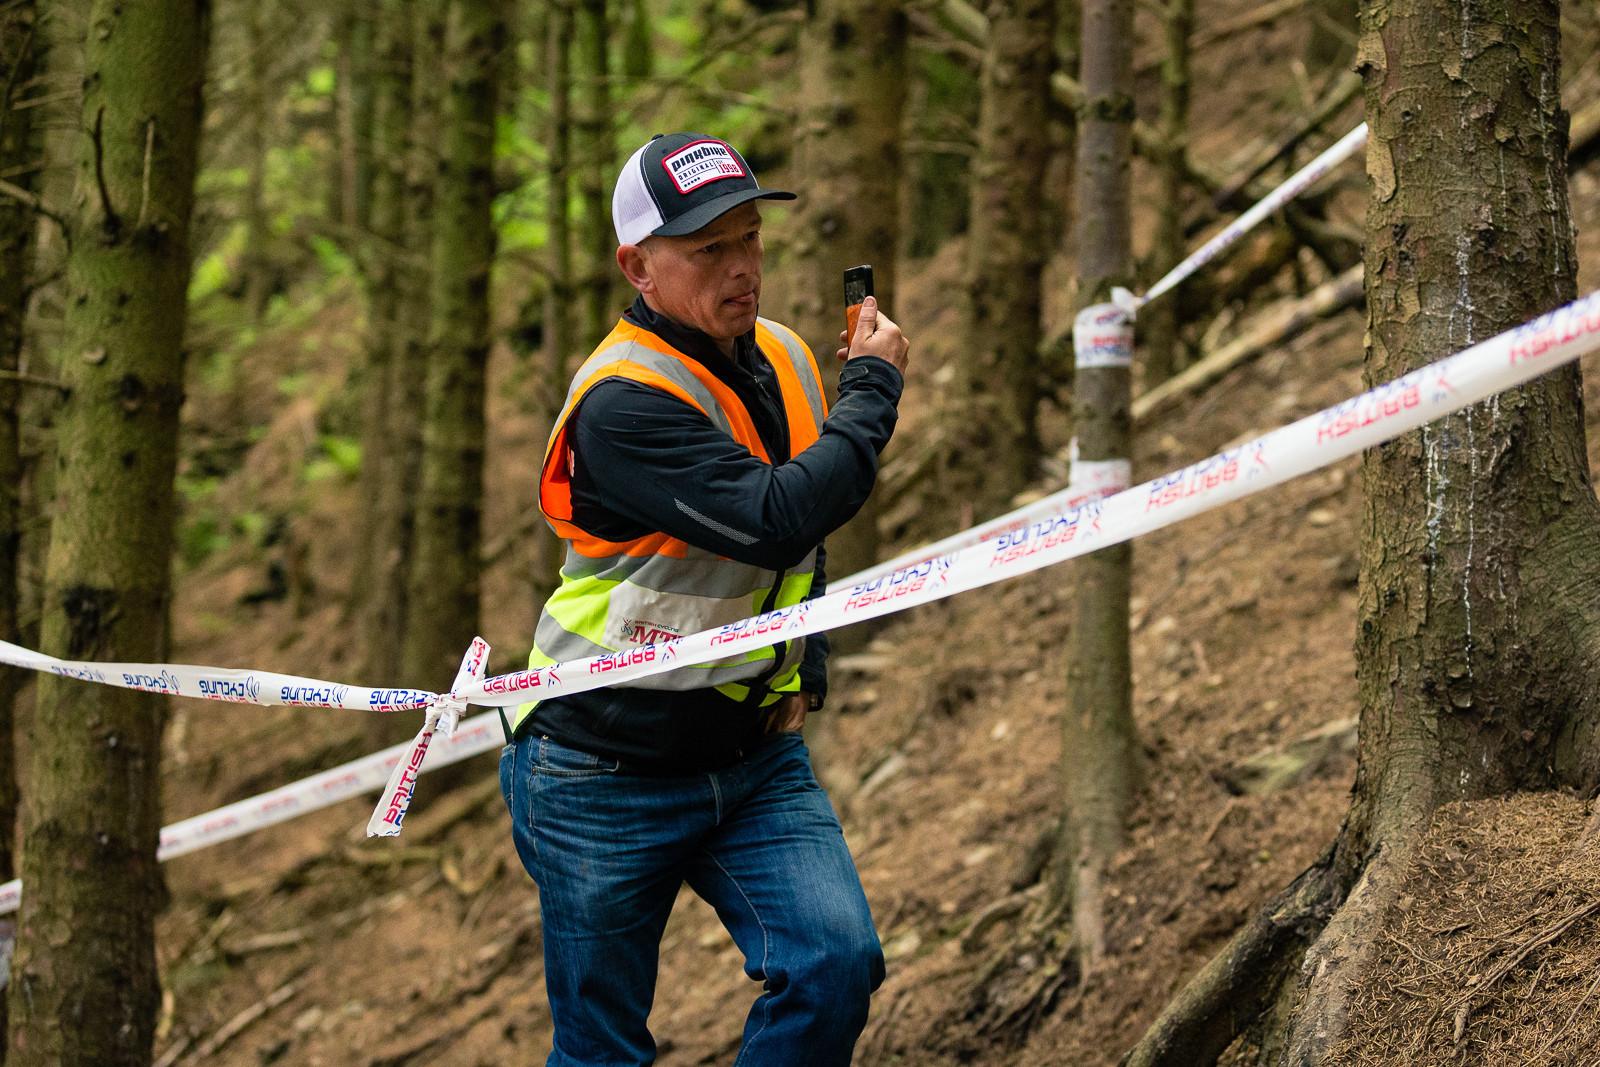 Si Patton, British Downhill Series Langollen - RACE REPORT - British Downhill Series Llangollen - Mountain Biking Pictures - Vital MTB